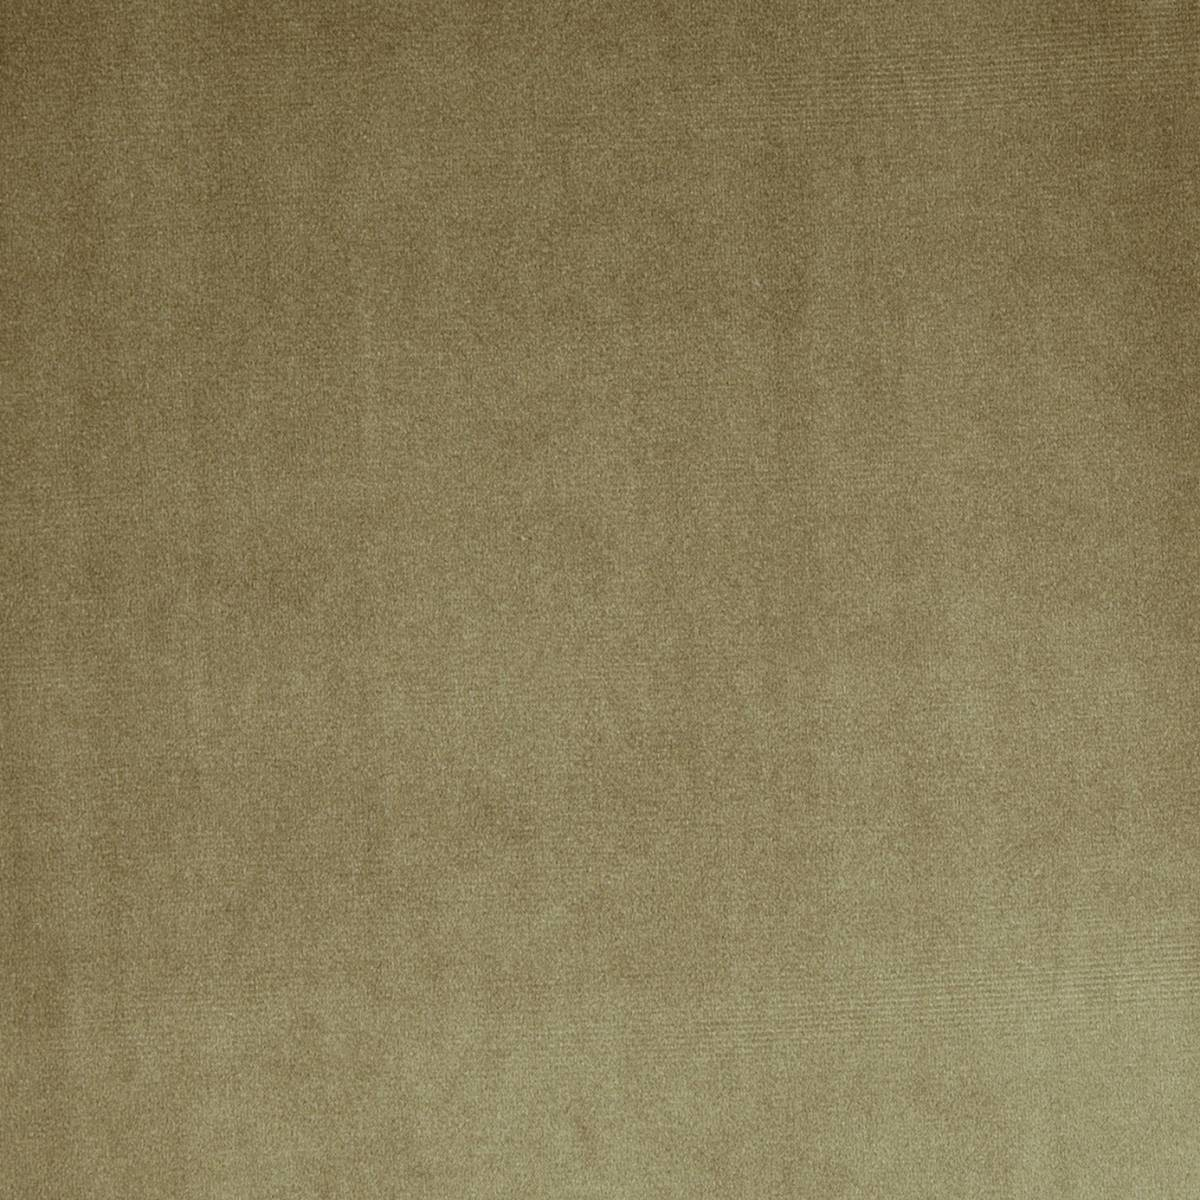 Velour fabric mink 7150 104 prestigious textiles for Velour fabric